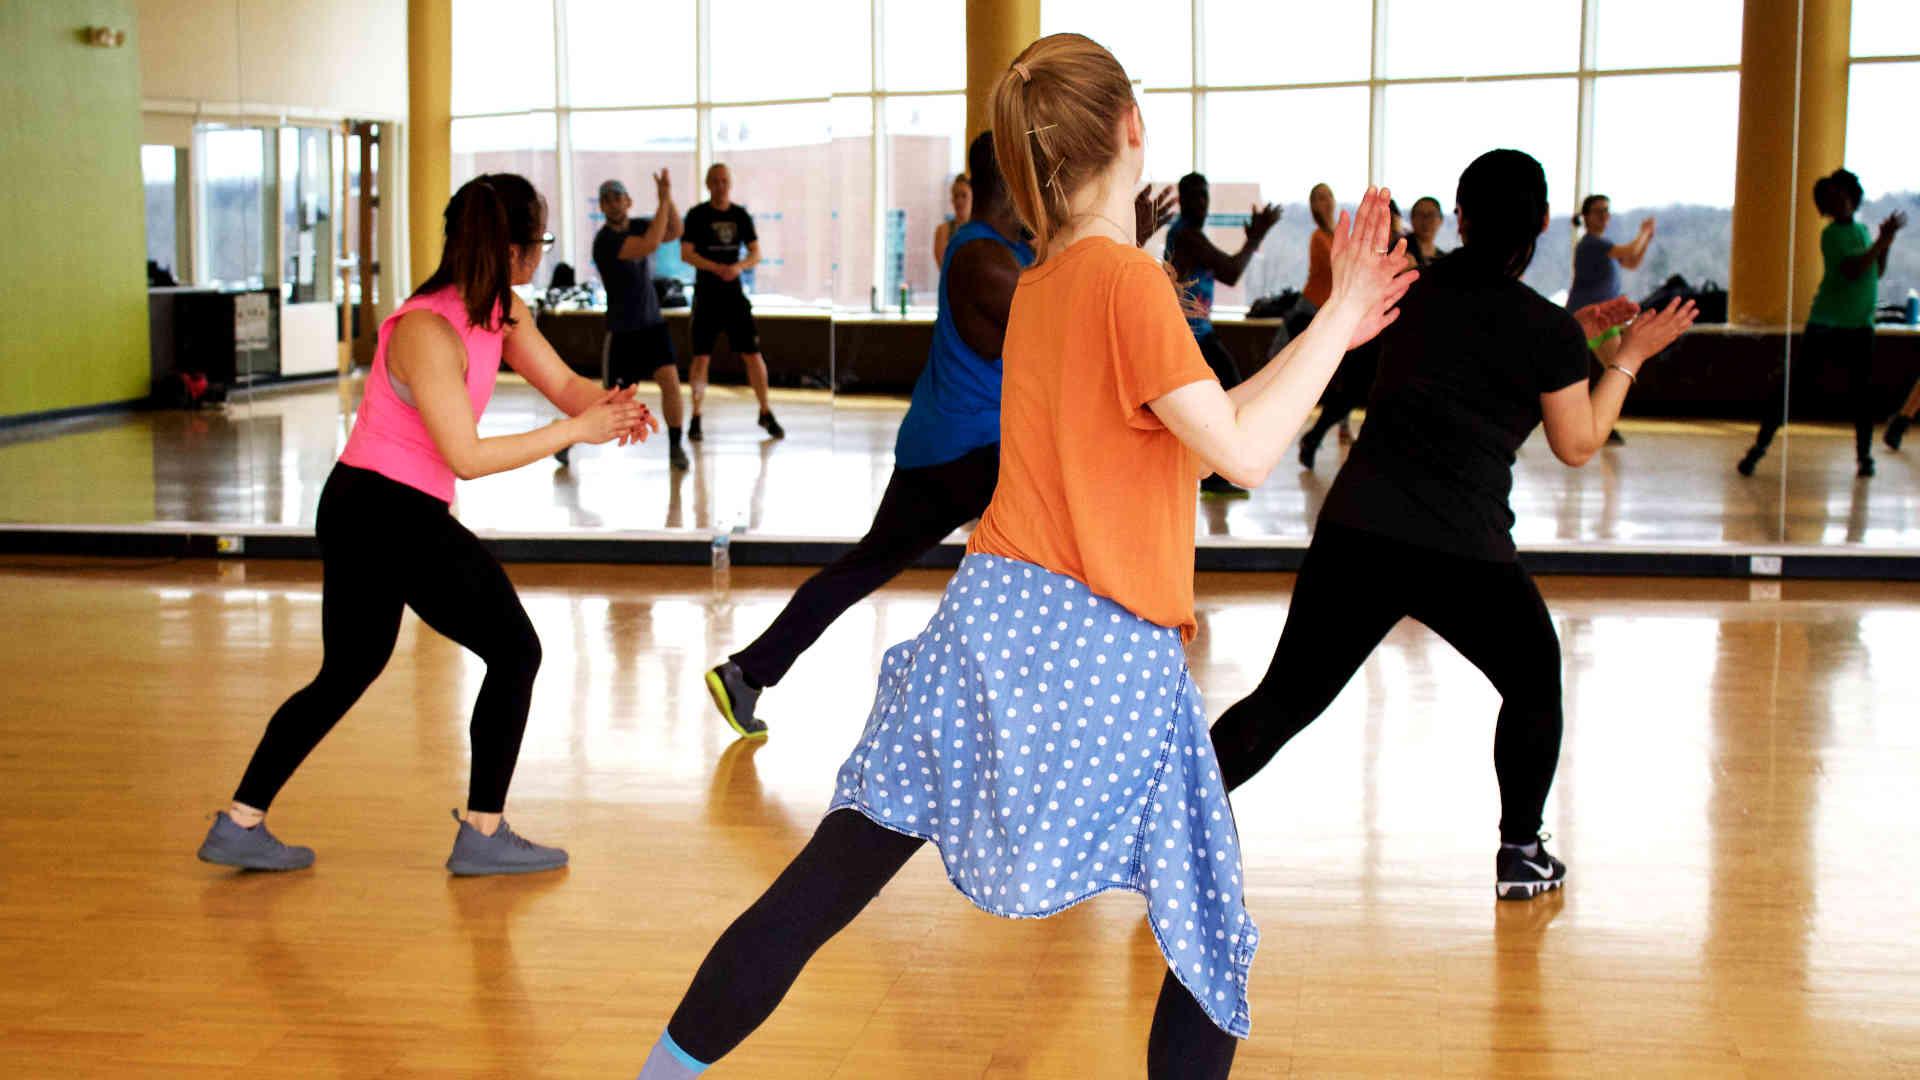 People participating in Summer Adult Dance Workshops